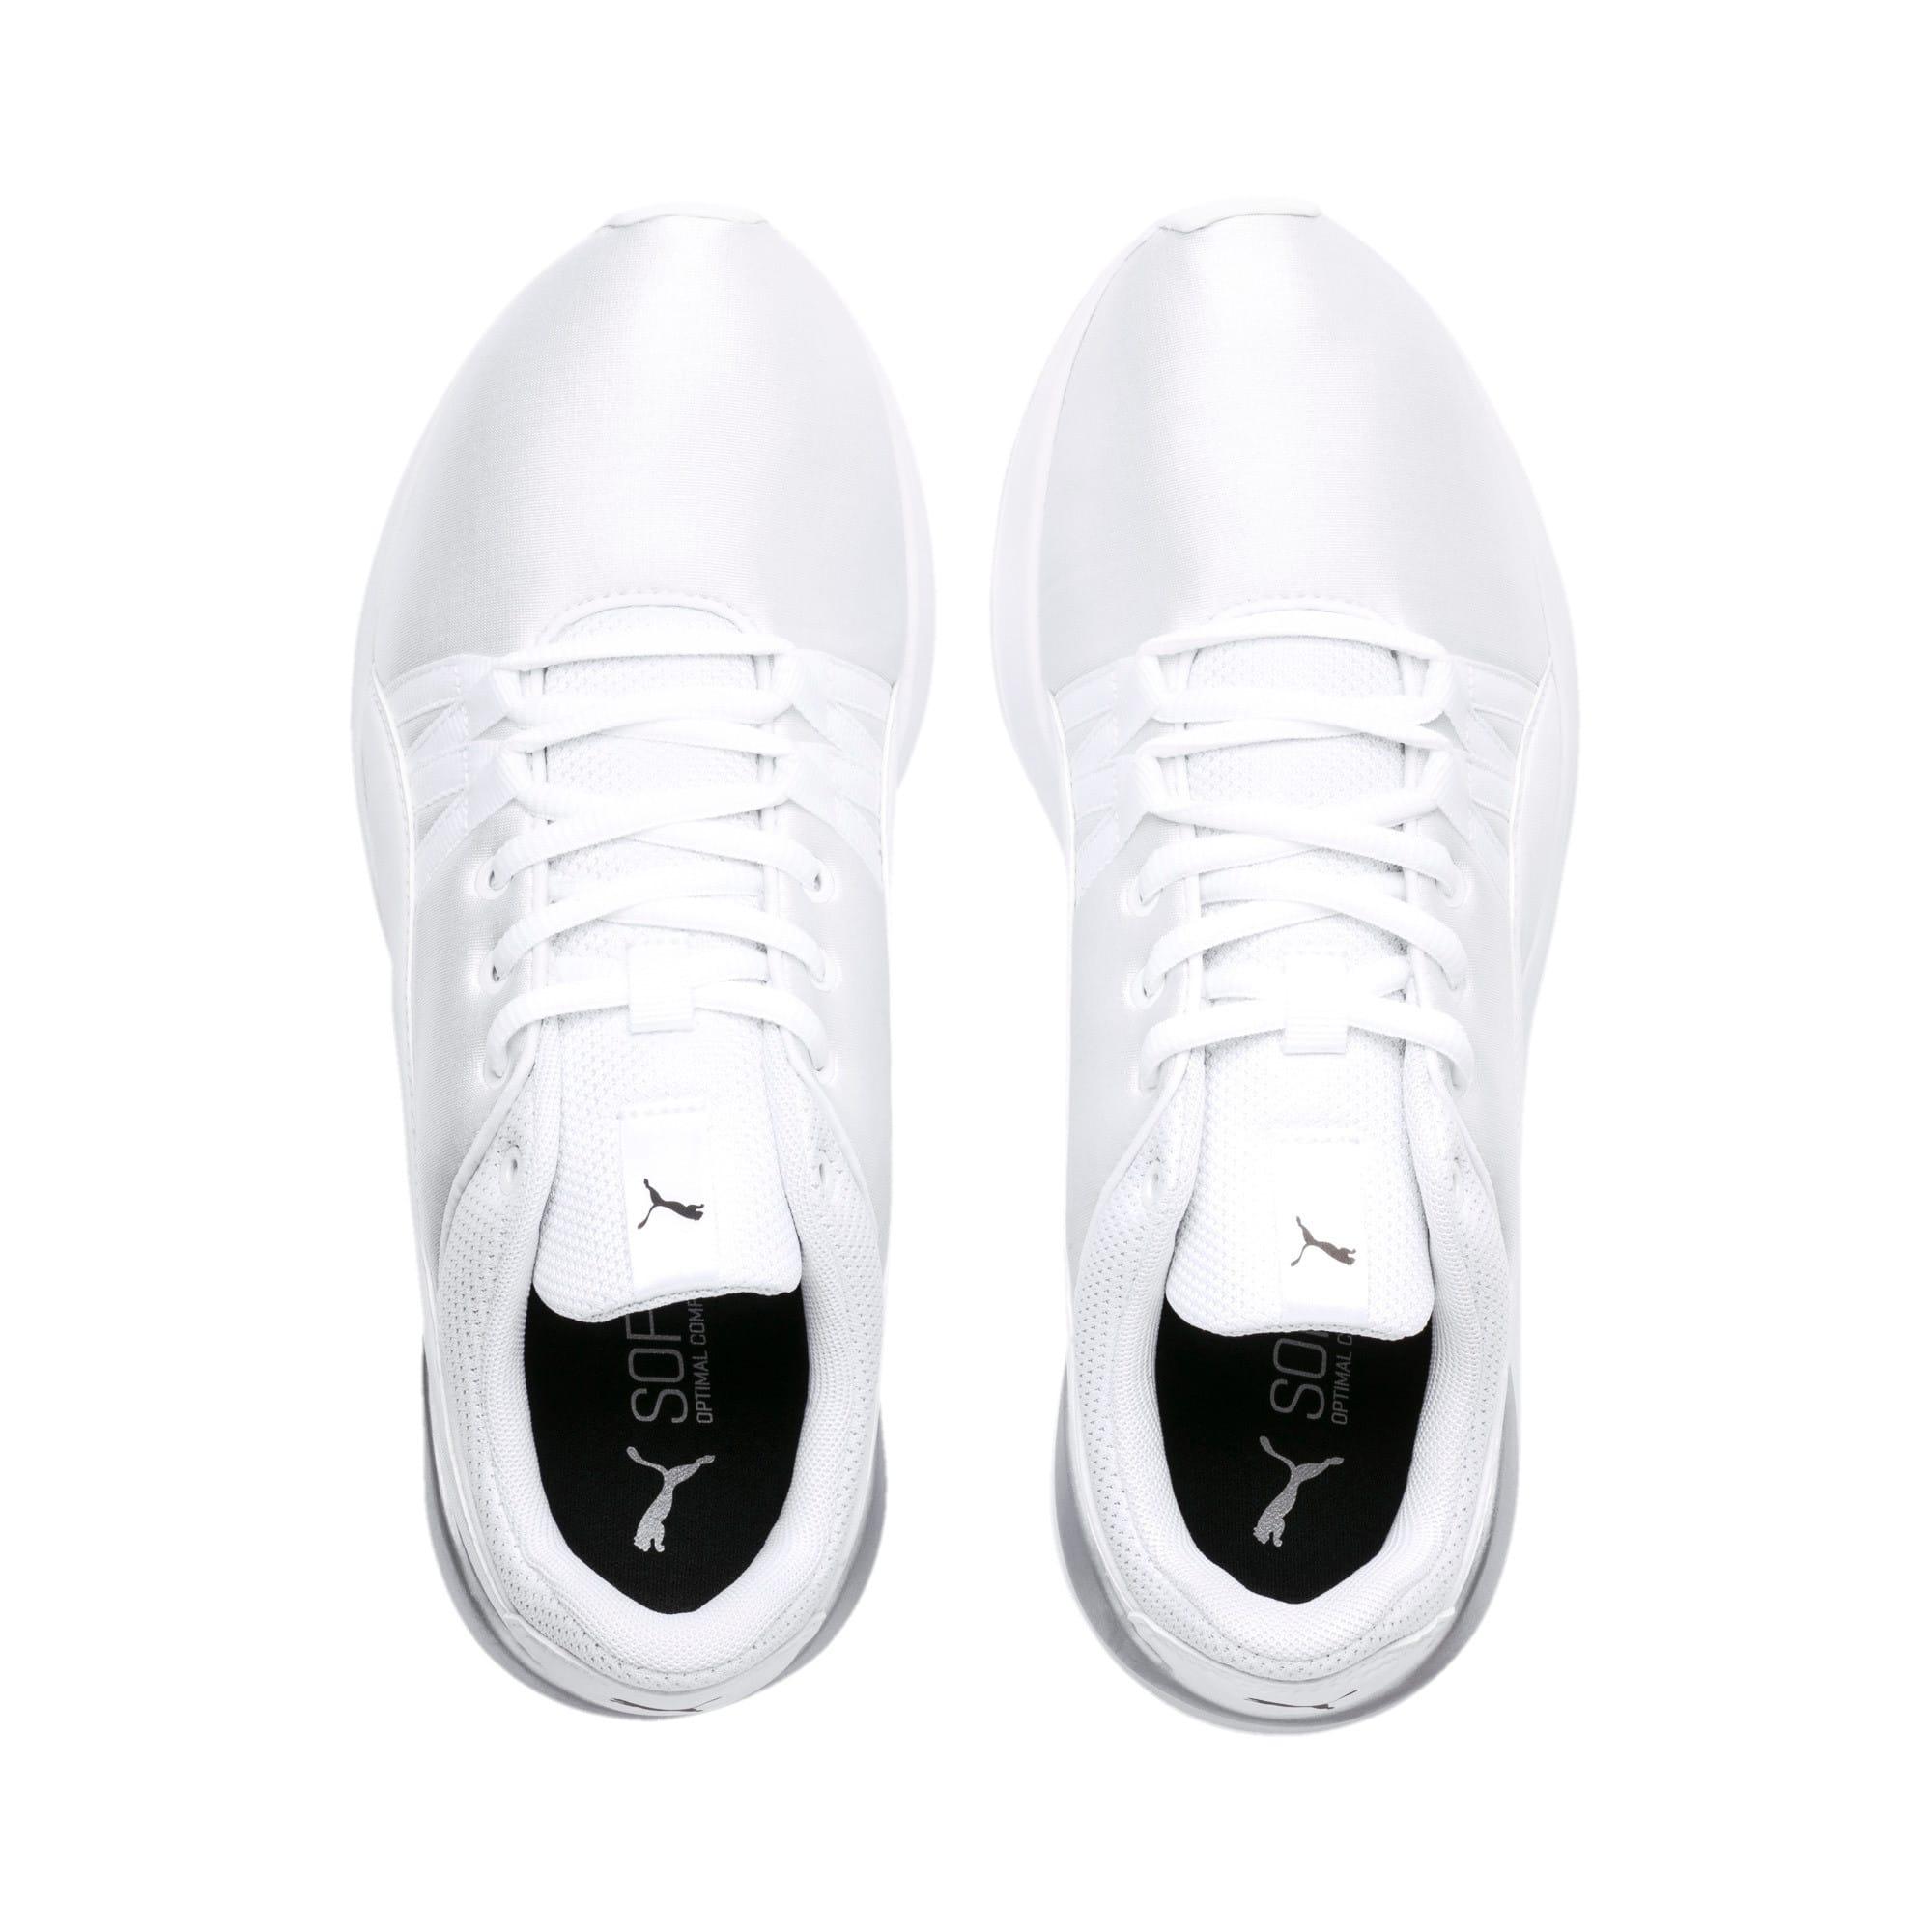 Thumbnail 6 of Adela Women's Sneakers, Puma White-Puma White, medium